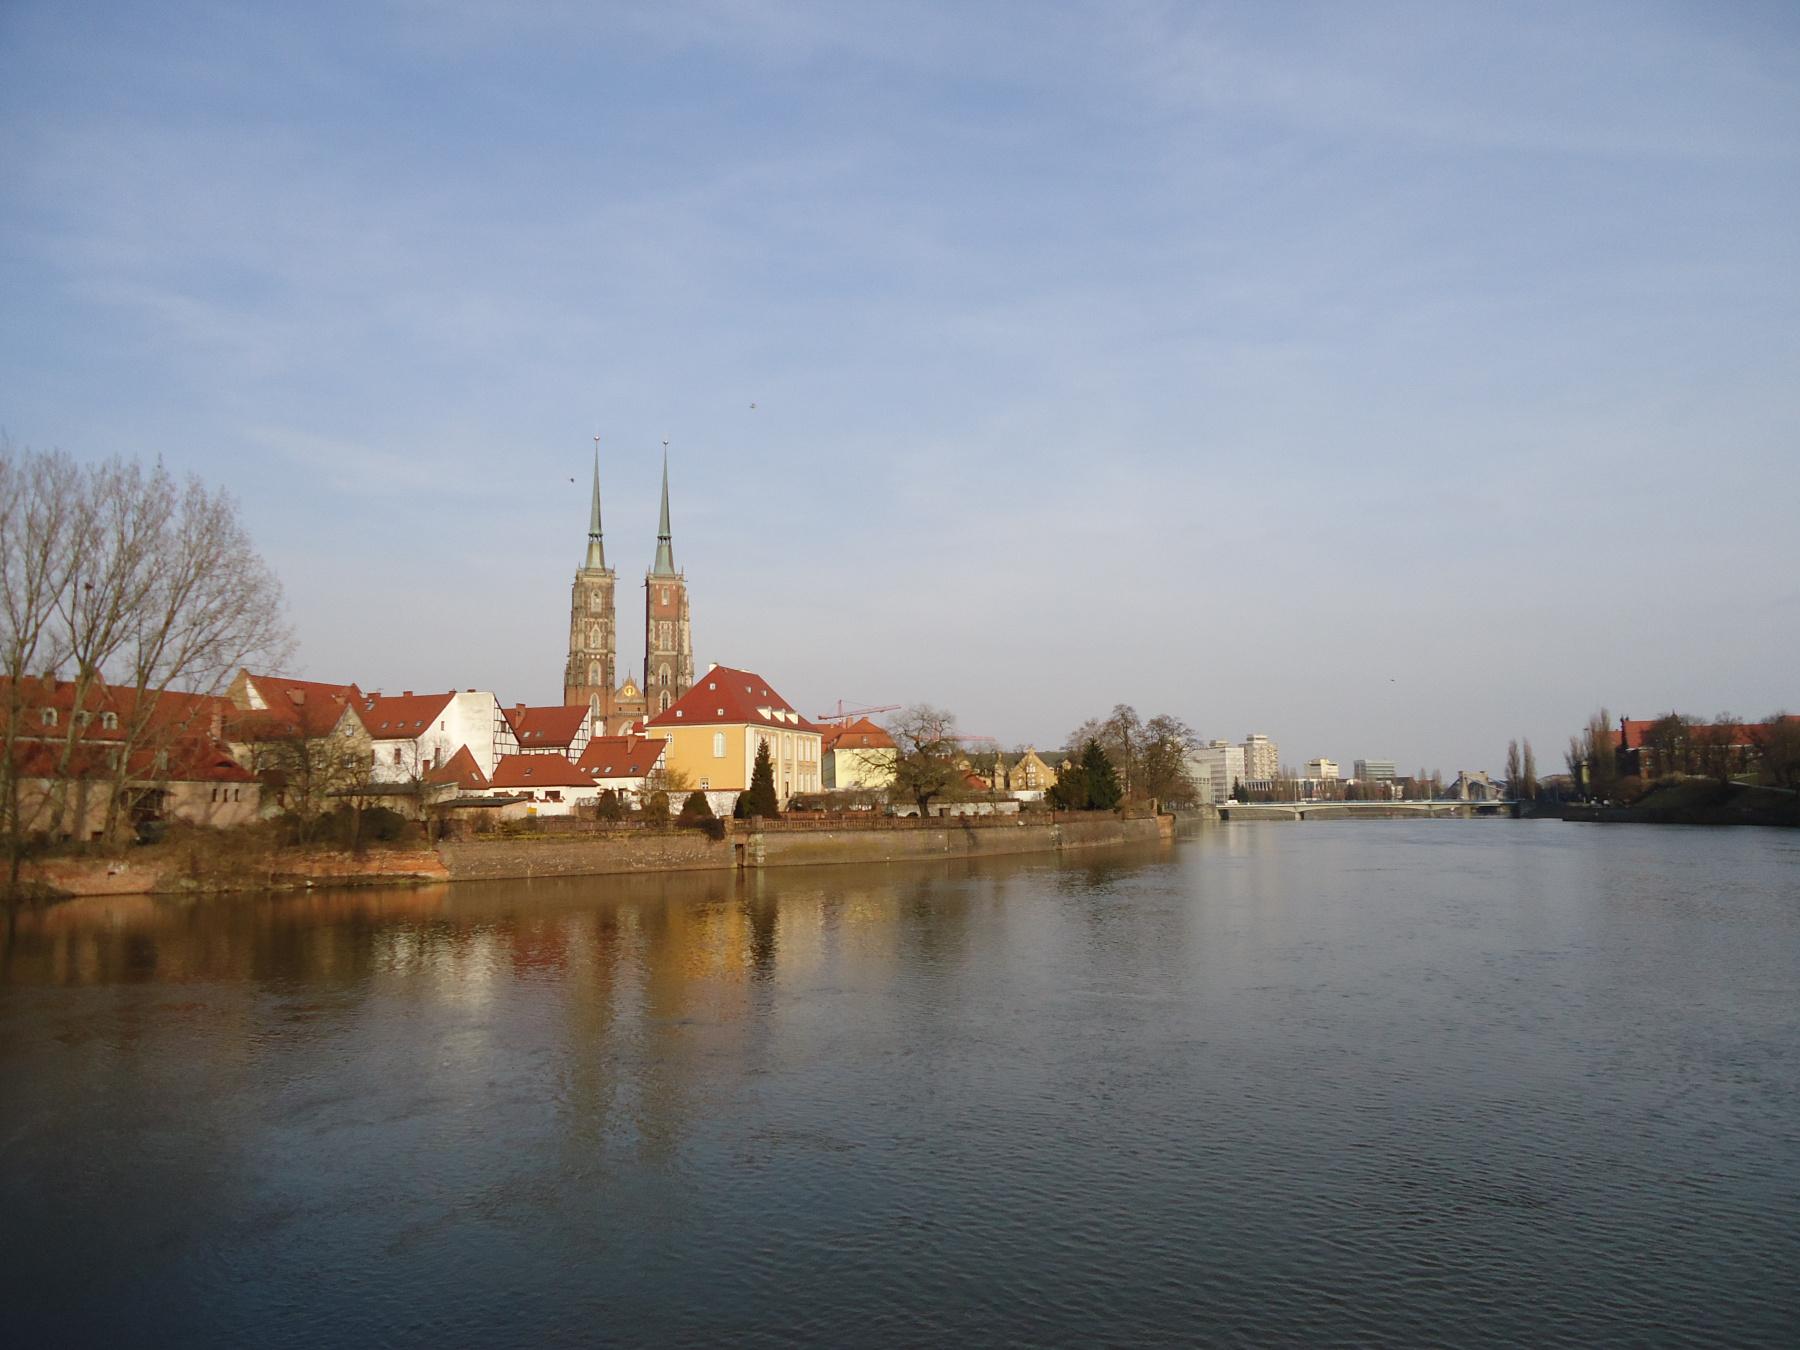 собор Иоанна Крестителя (Archikatedra sw. Jana Chrzciciela)